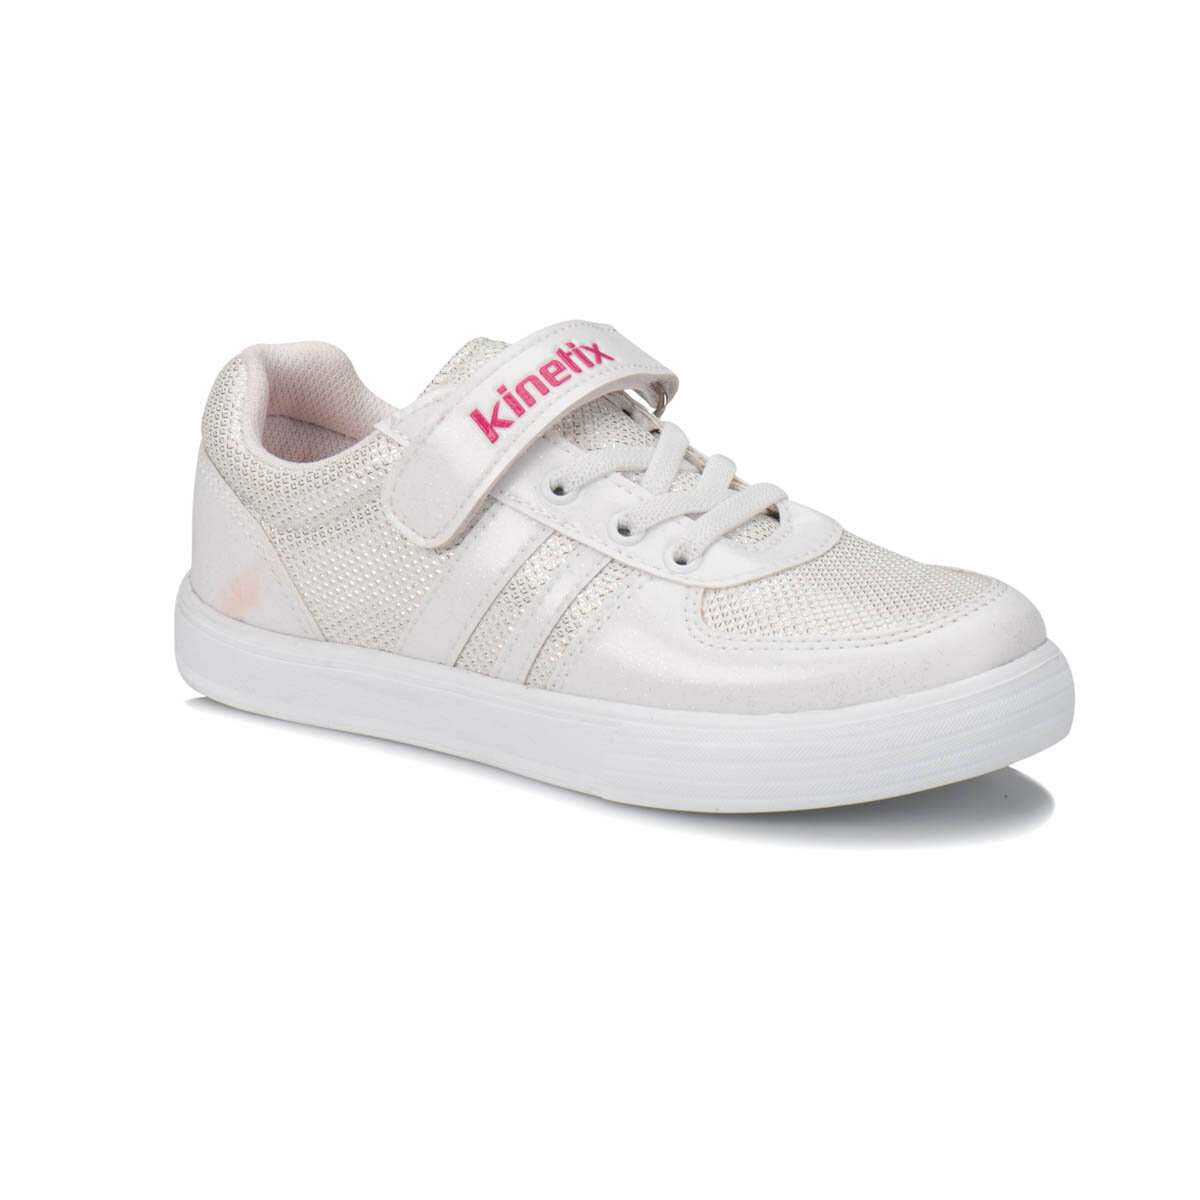 FLO MASSIN White Female Child Sneaker Shoes KINETIX